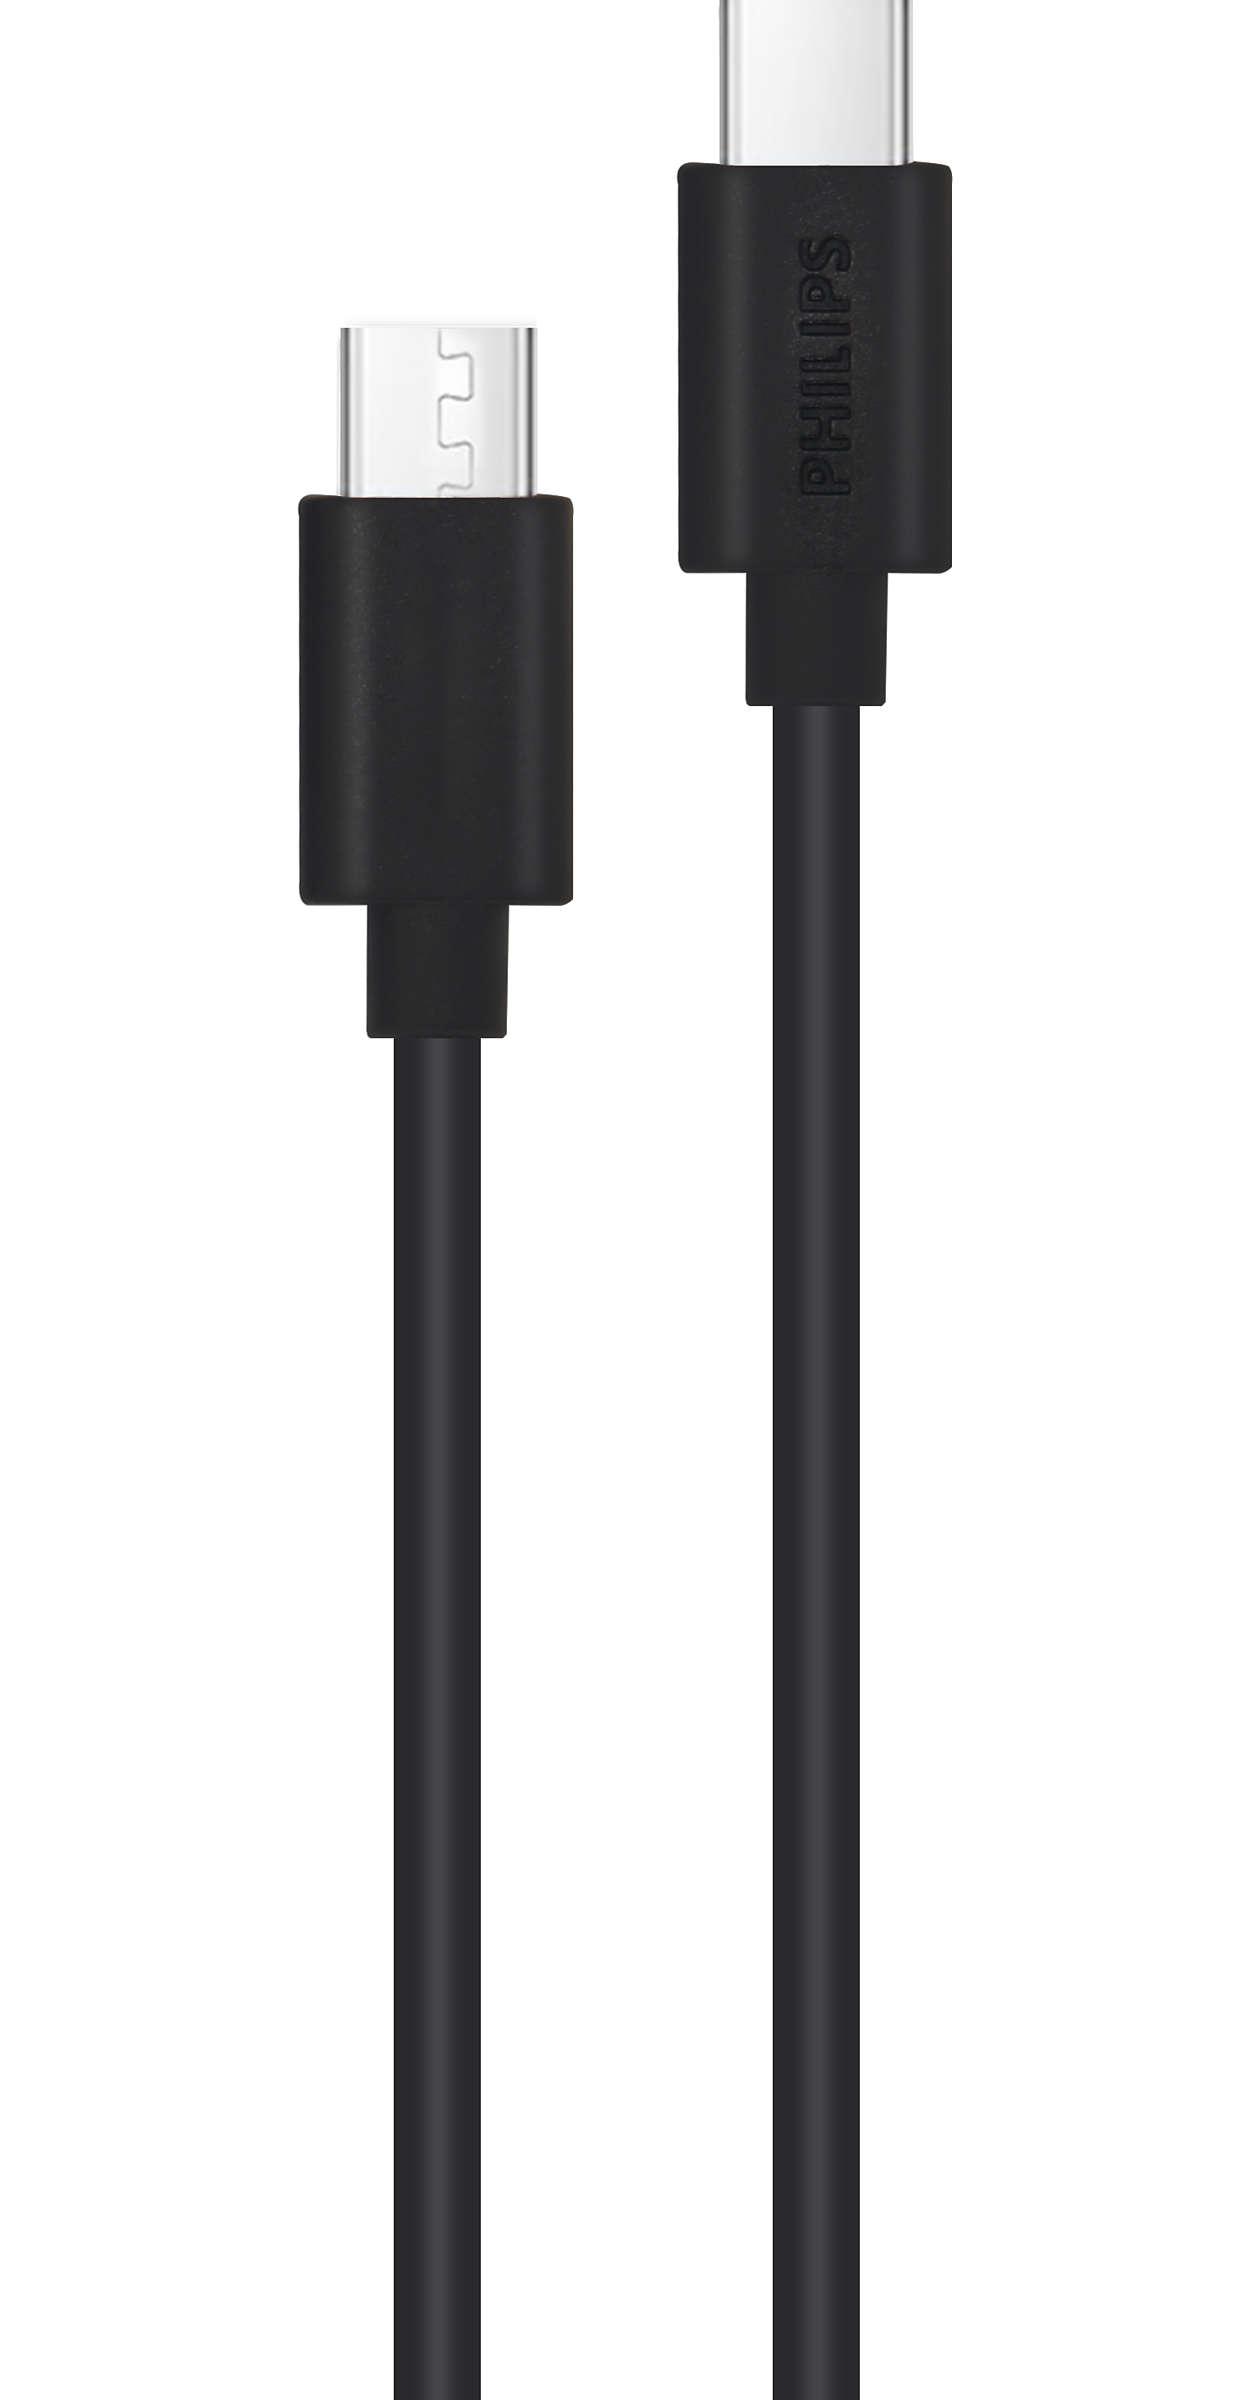 Câble USB-C> USB-C d'1,2m